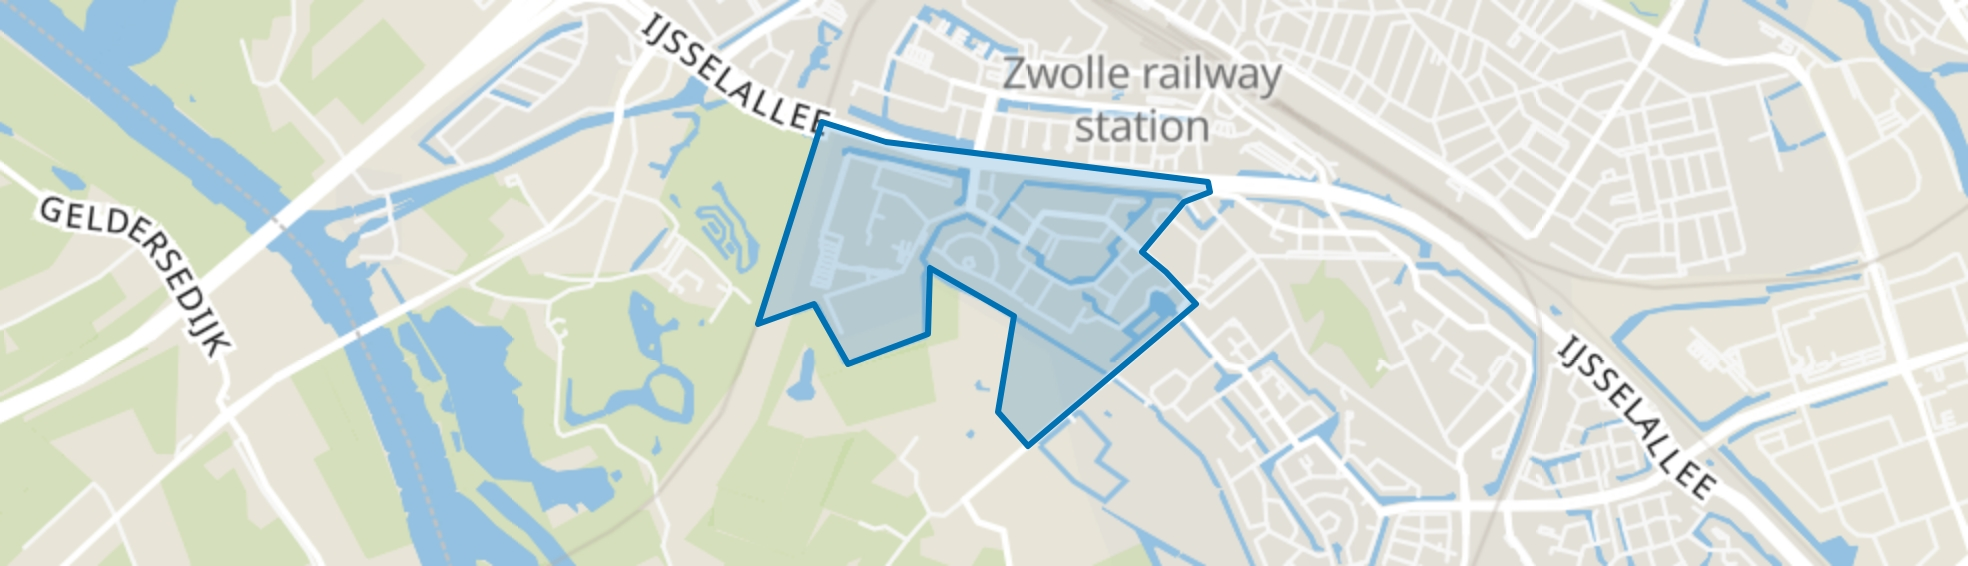 Schellerbroek, Zwolle map